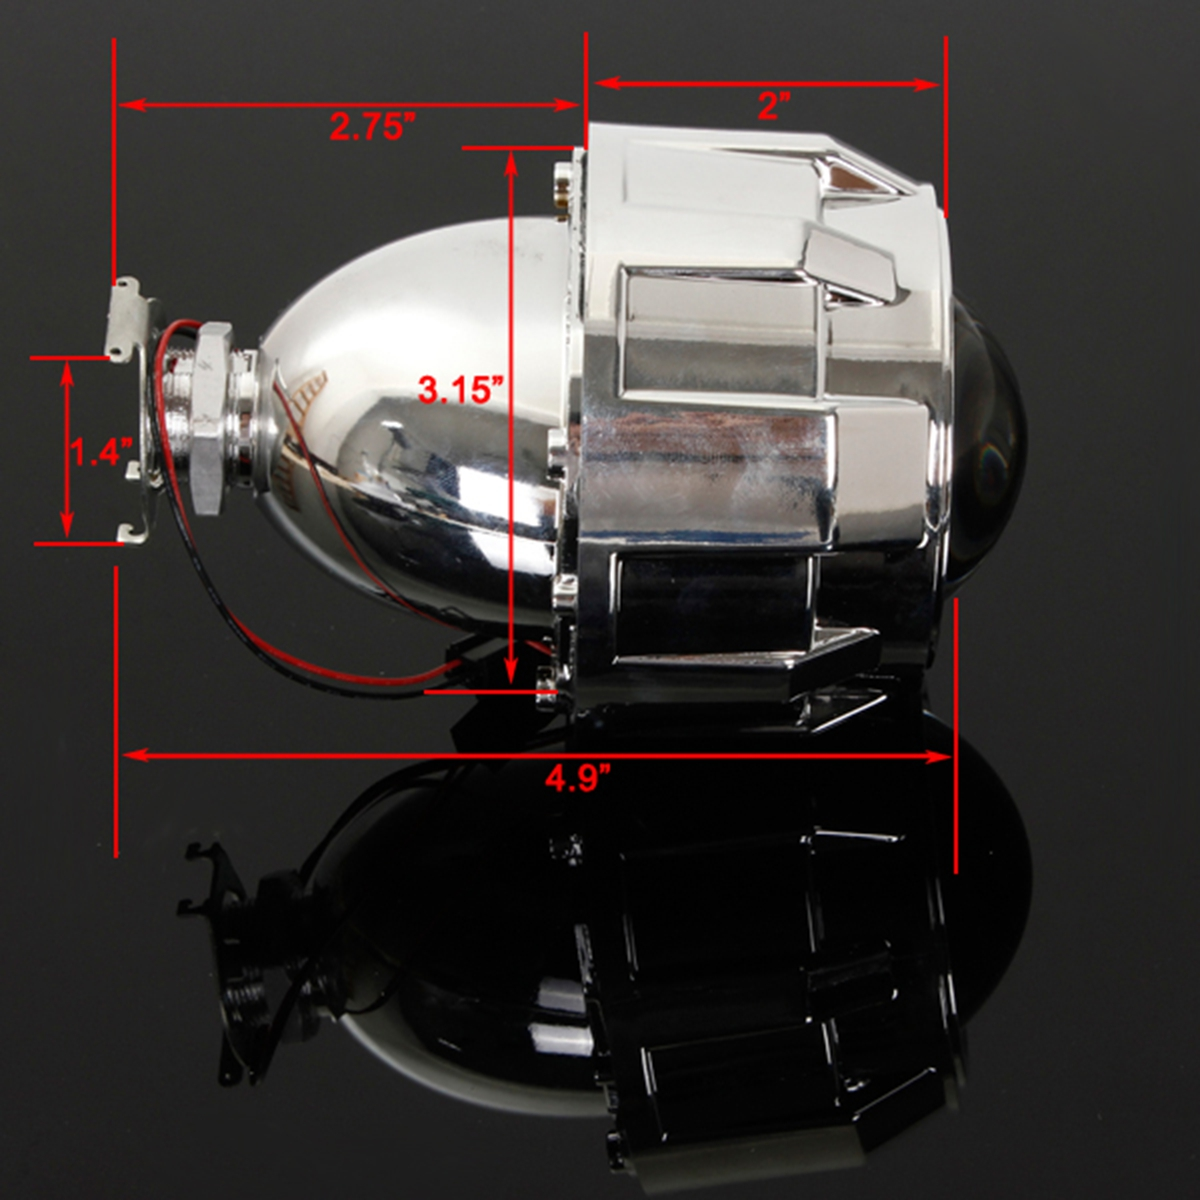 2 5 car mini bi xenon hid projector lens angels eye. Black Bedroom Furniture Sets. Home Design Ideas